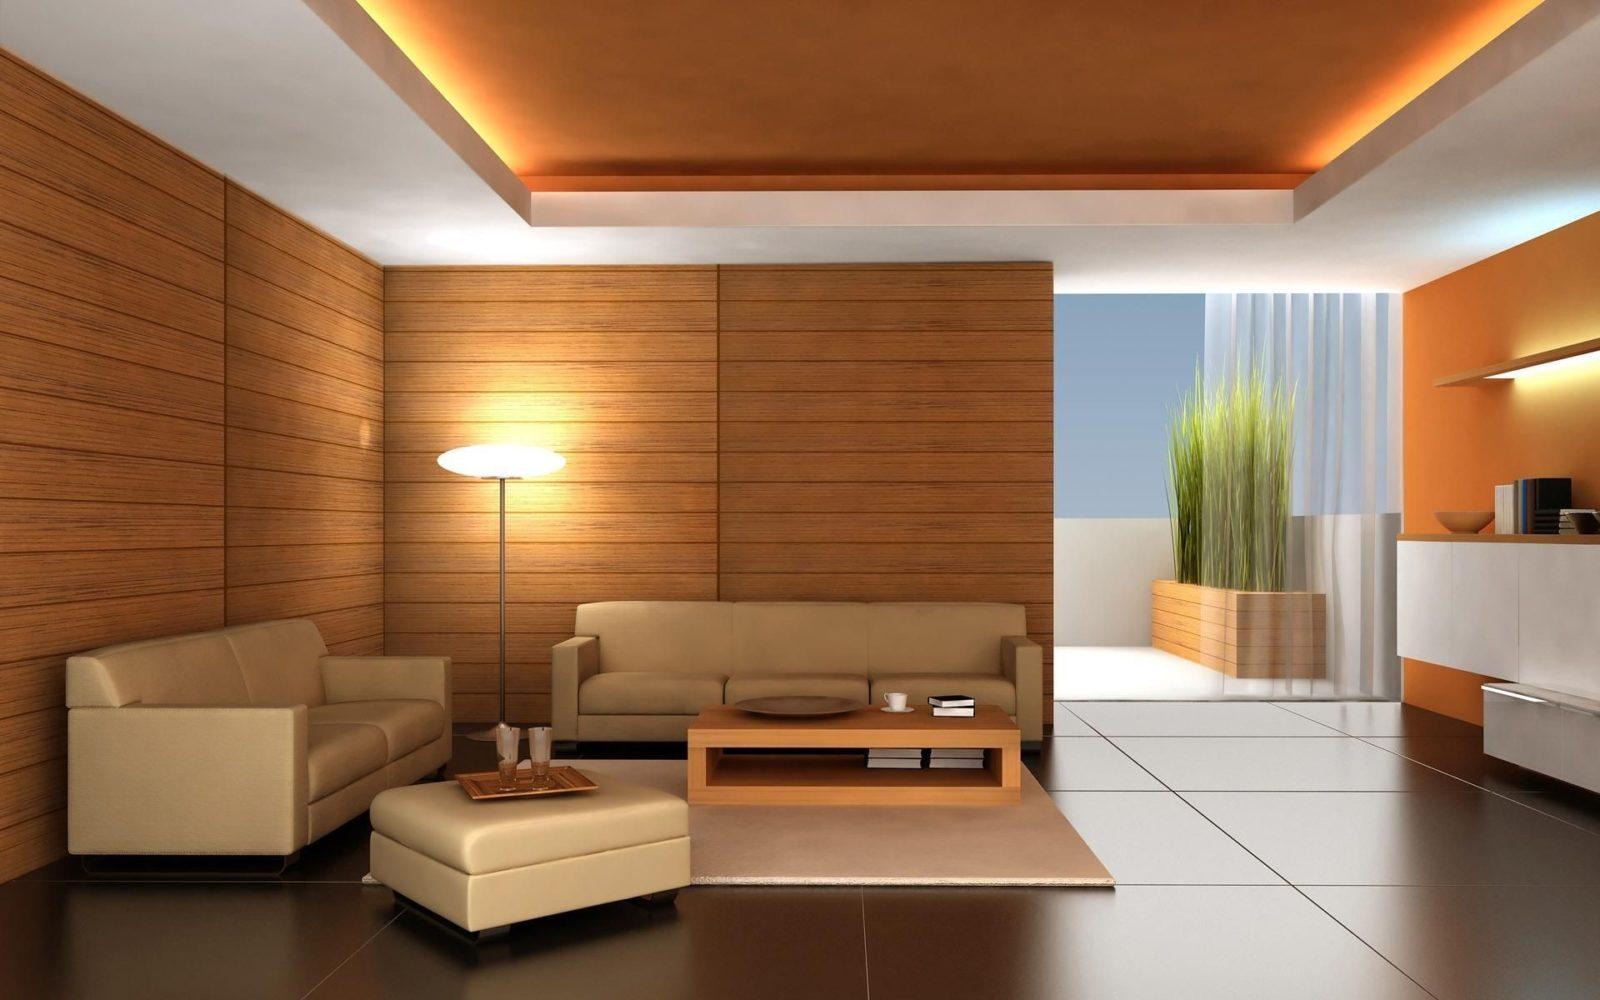 Zen Design ceilings - Taskmasters, Dubai